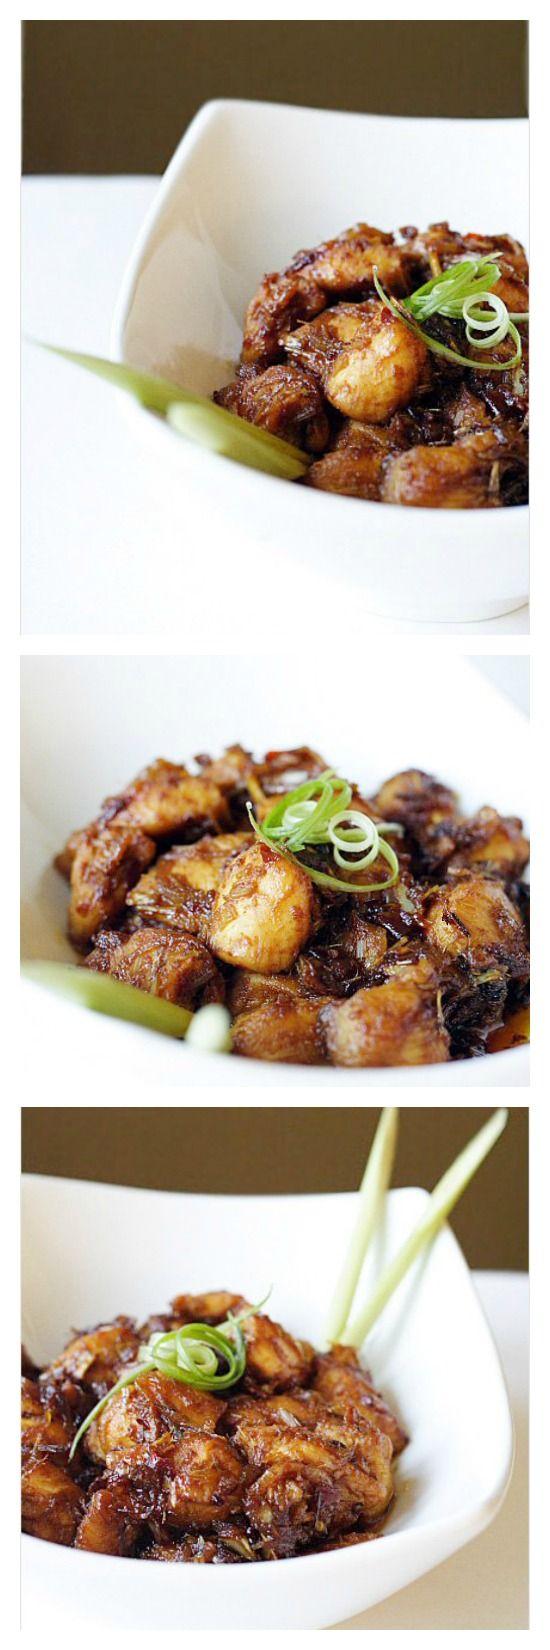 Simply enjoy asian sauce recipes was